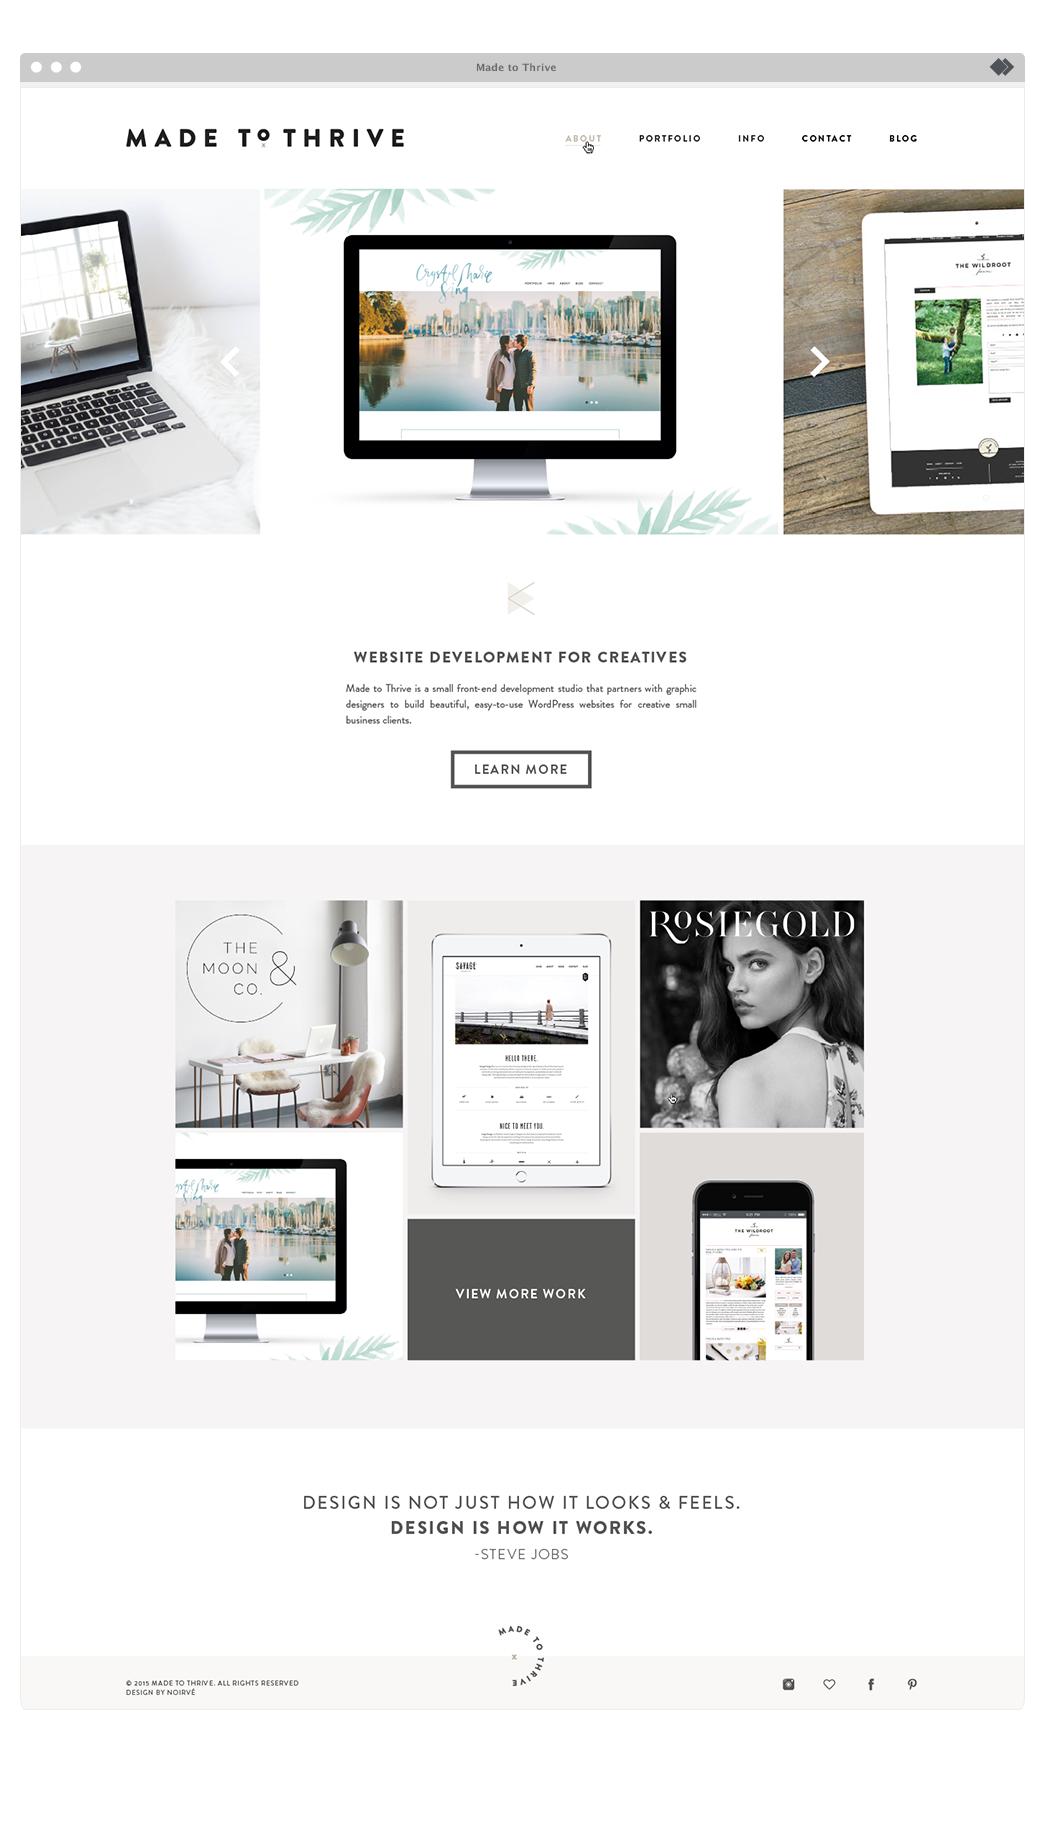 Branding And Website Design For Made To Thrive A Small Front End Development Studio That Partn Diseno Web Inspiracion Desarrollo De Sitios Web Disenos De Unas